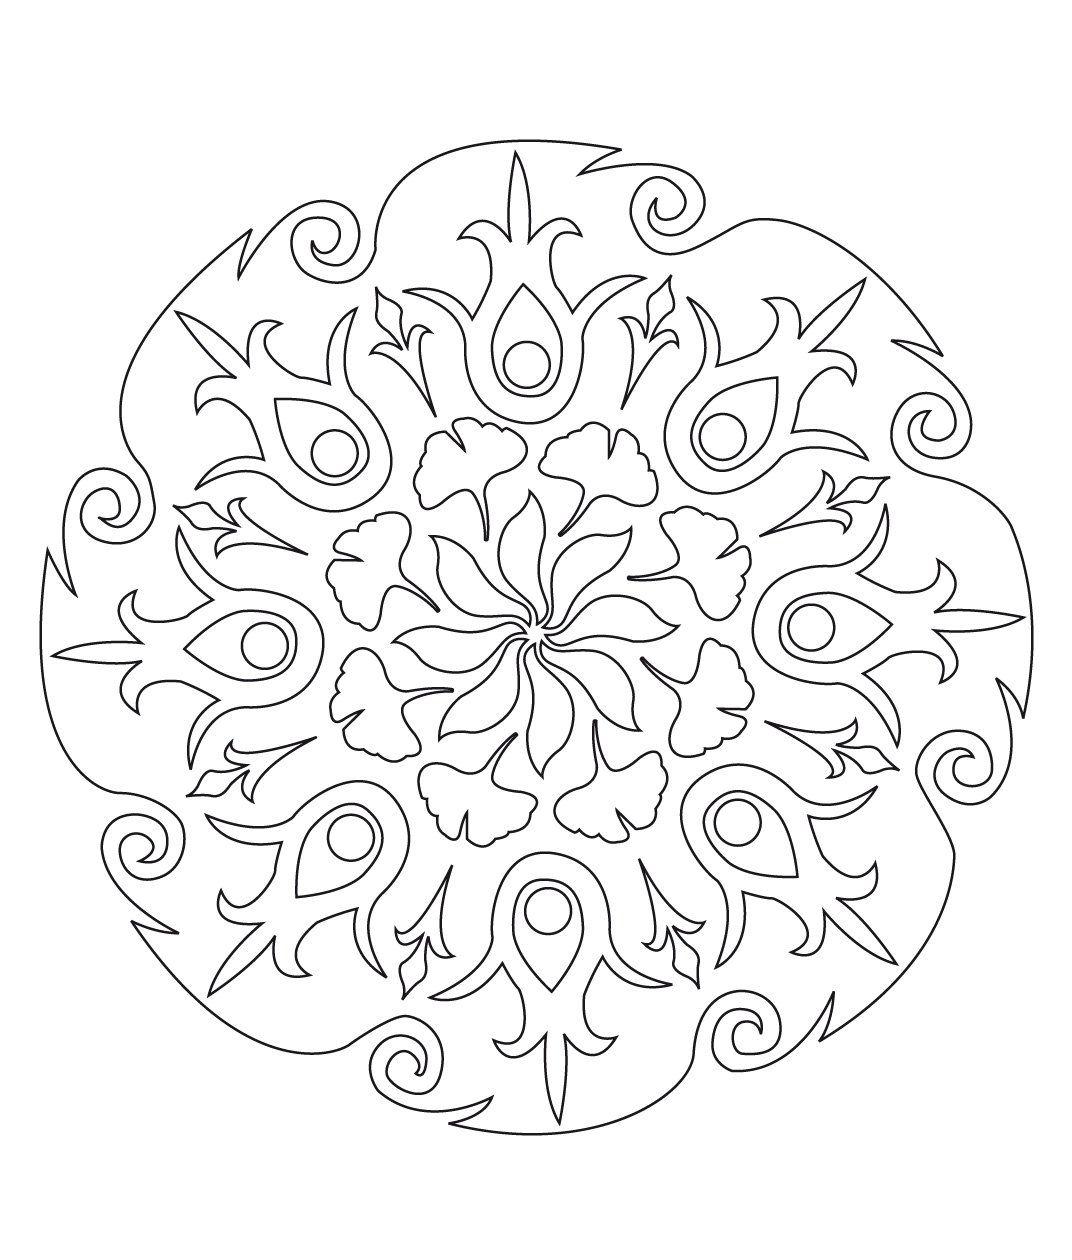 Mandala | Pyrography Patterns | Pinterest | Mandalas, Pintar platos ...